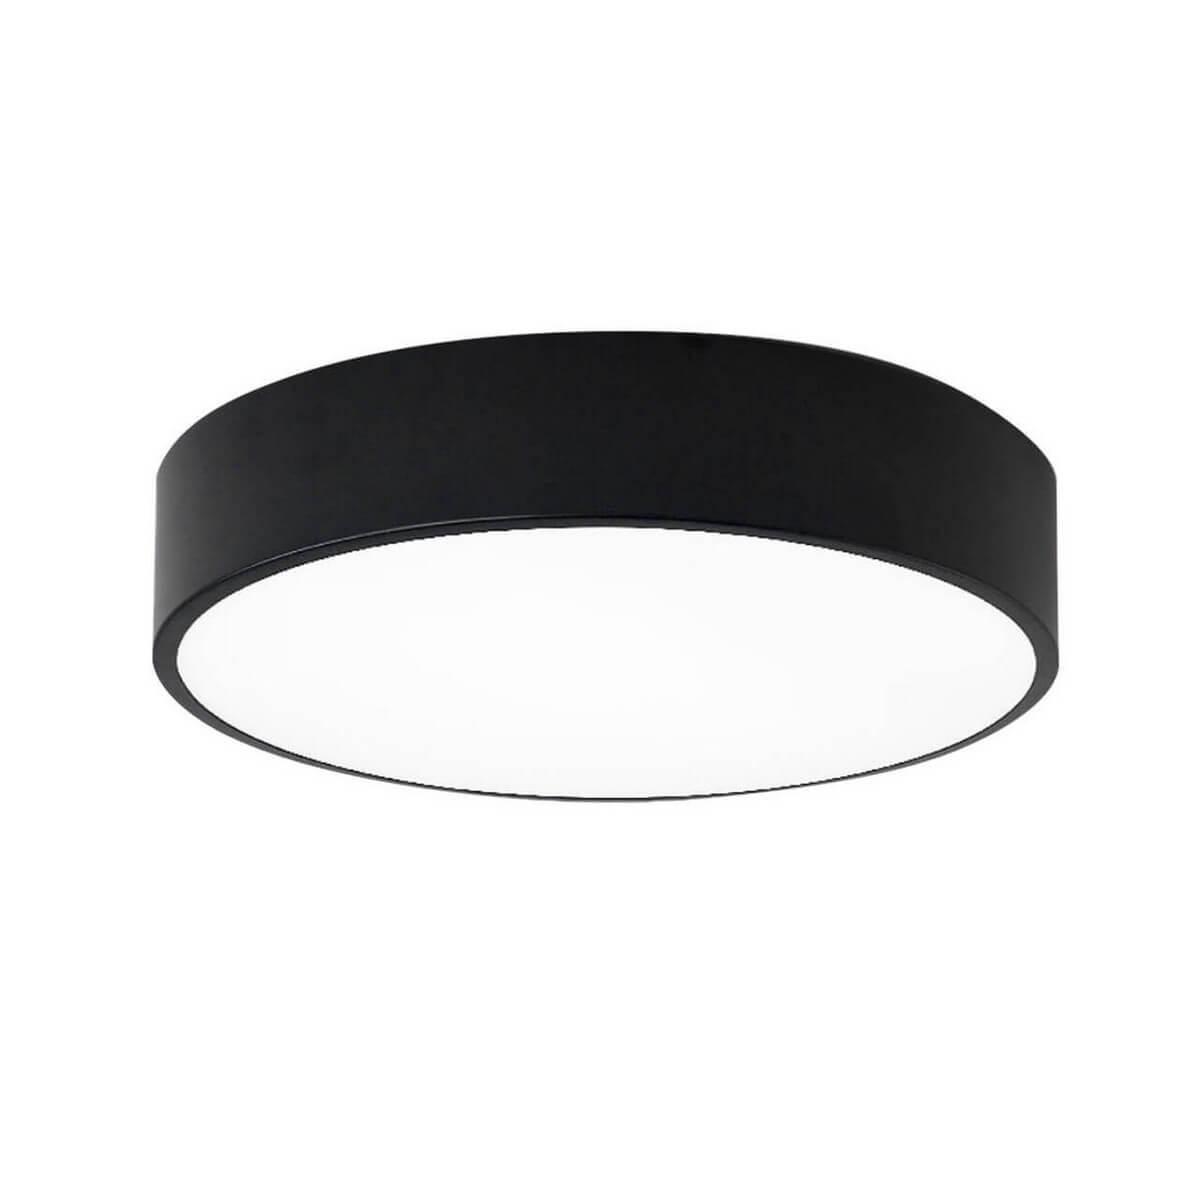 Фото - Накладной светильник Kink Light 05460,19, LED, 48 Вт накладной светильник kink light фейерверк 08013